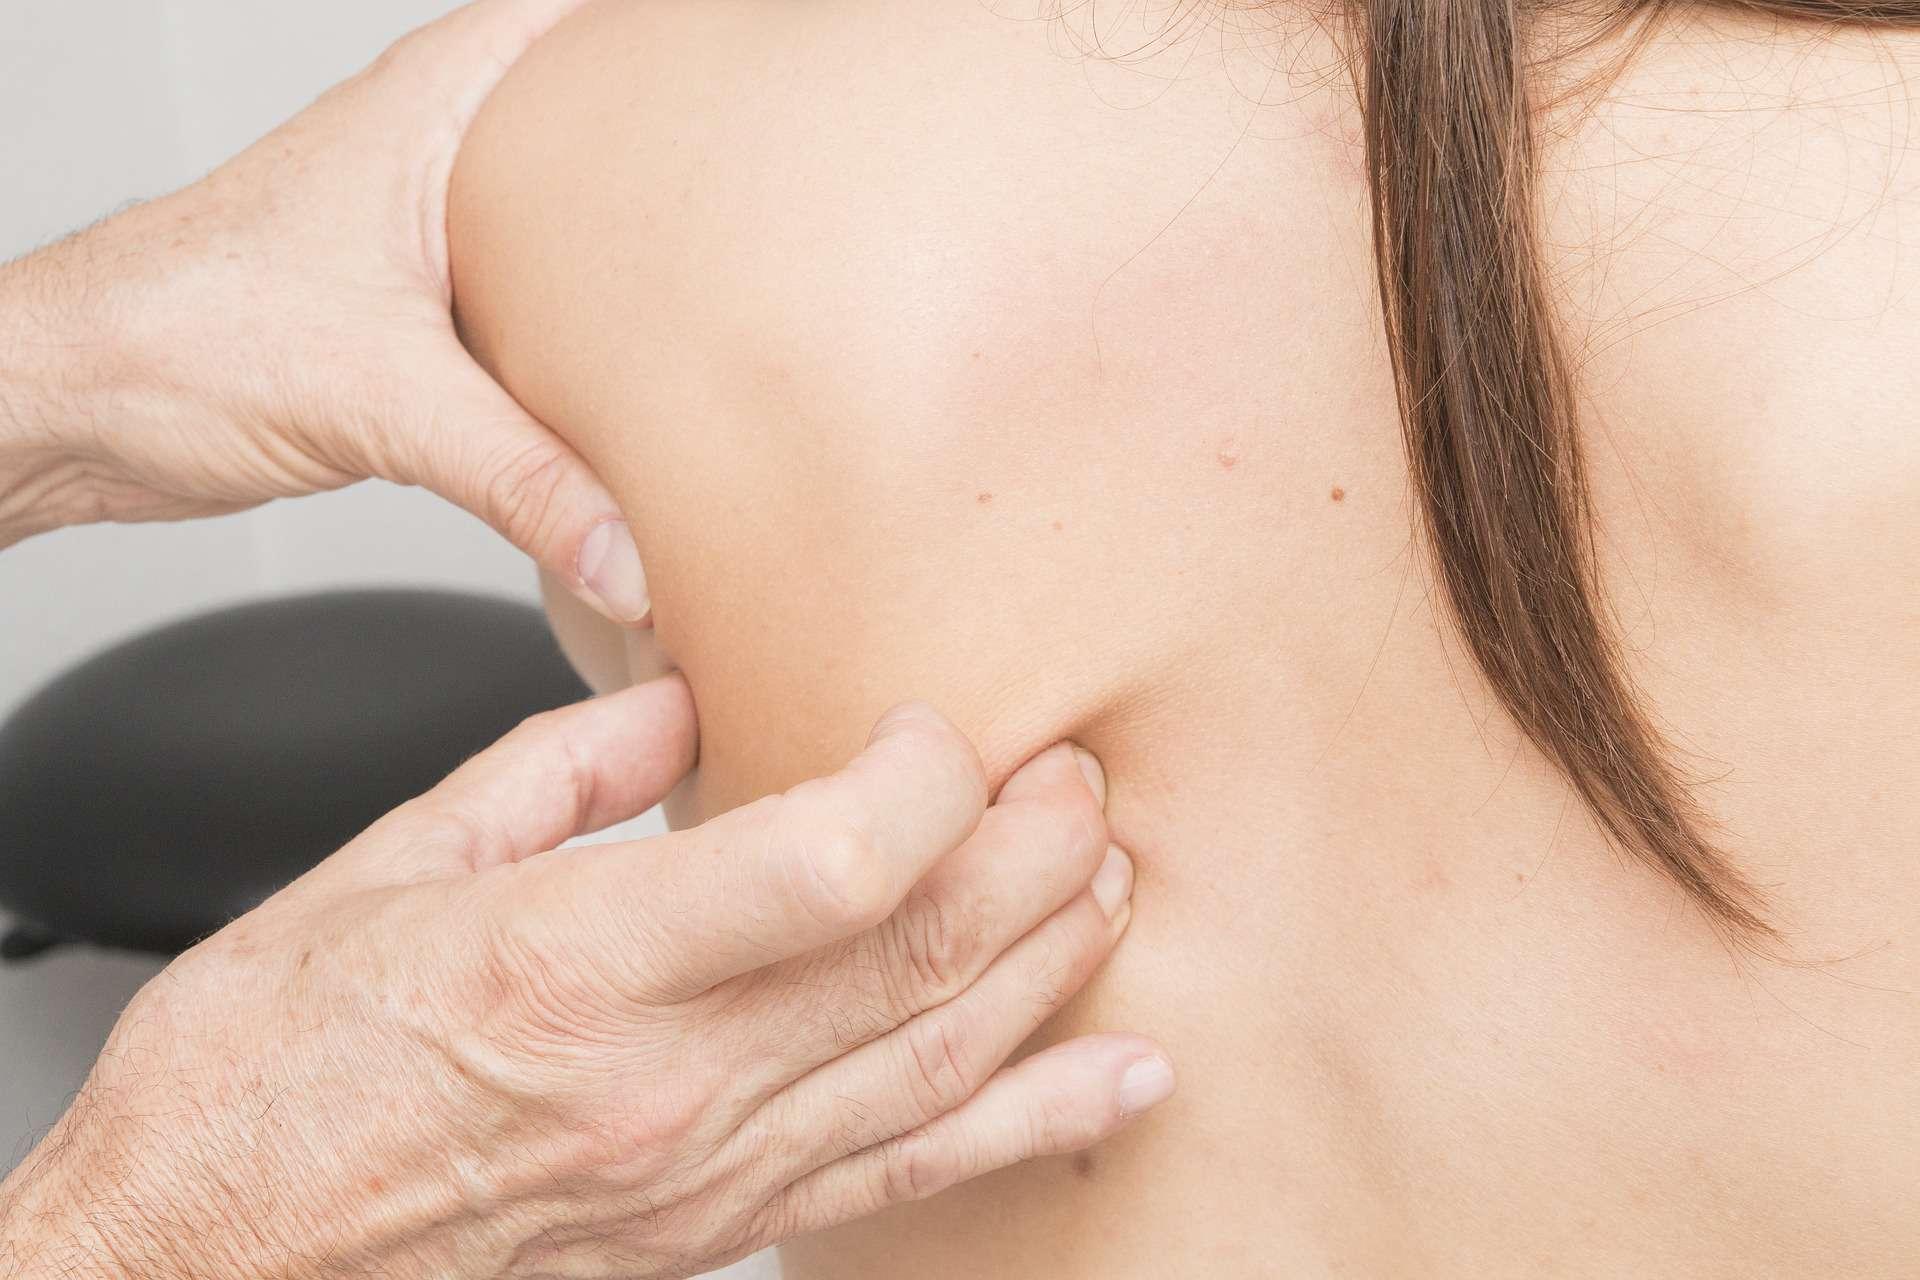 Tui Na Acupressure Massage Chinese Medicine Relaxation Energy Vitality